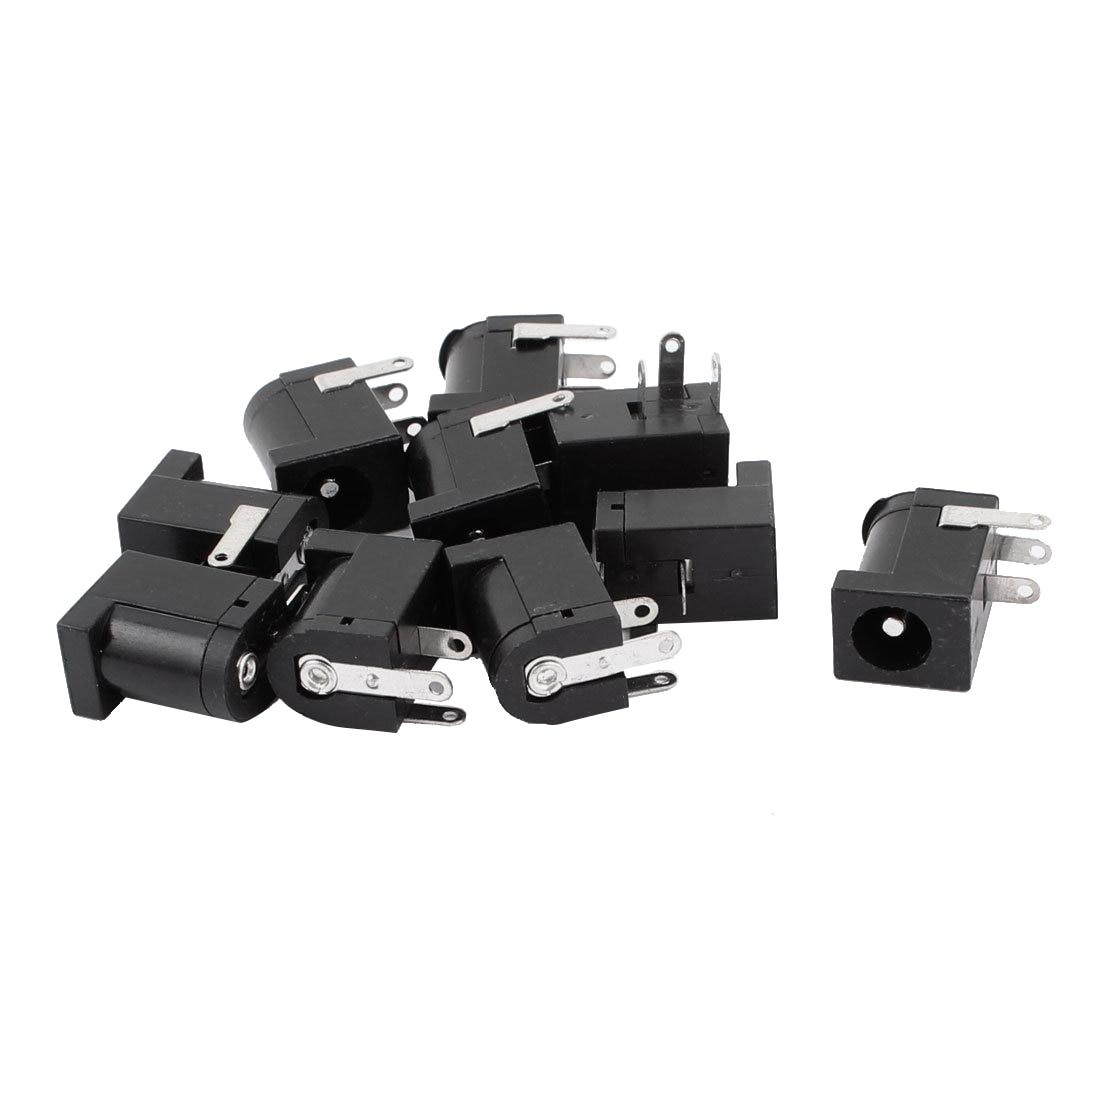 10pcs 3 Pin PCB Mount 5 5x2 1mm Female DC Power Jack Socket Connector